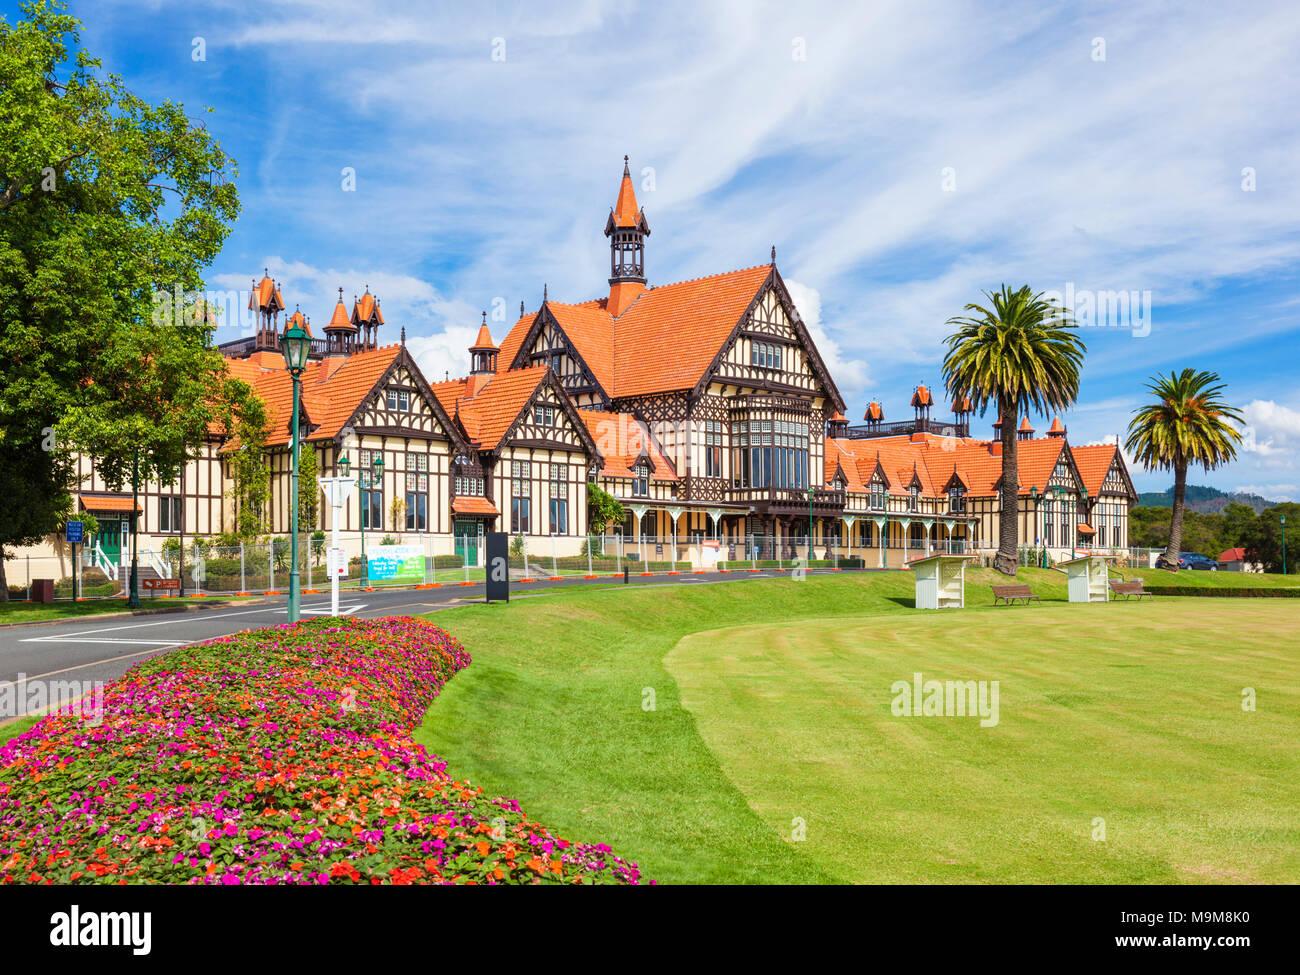 Neuseeland rotorua Neuseeland Rotorua Museum im Tudor Stil Government Gardens Rotorua Stadt North Island, Neuseeland Stockbild